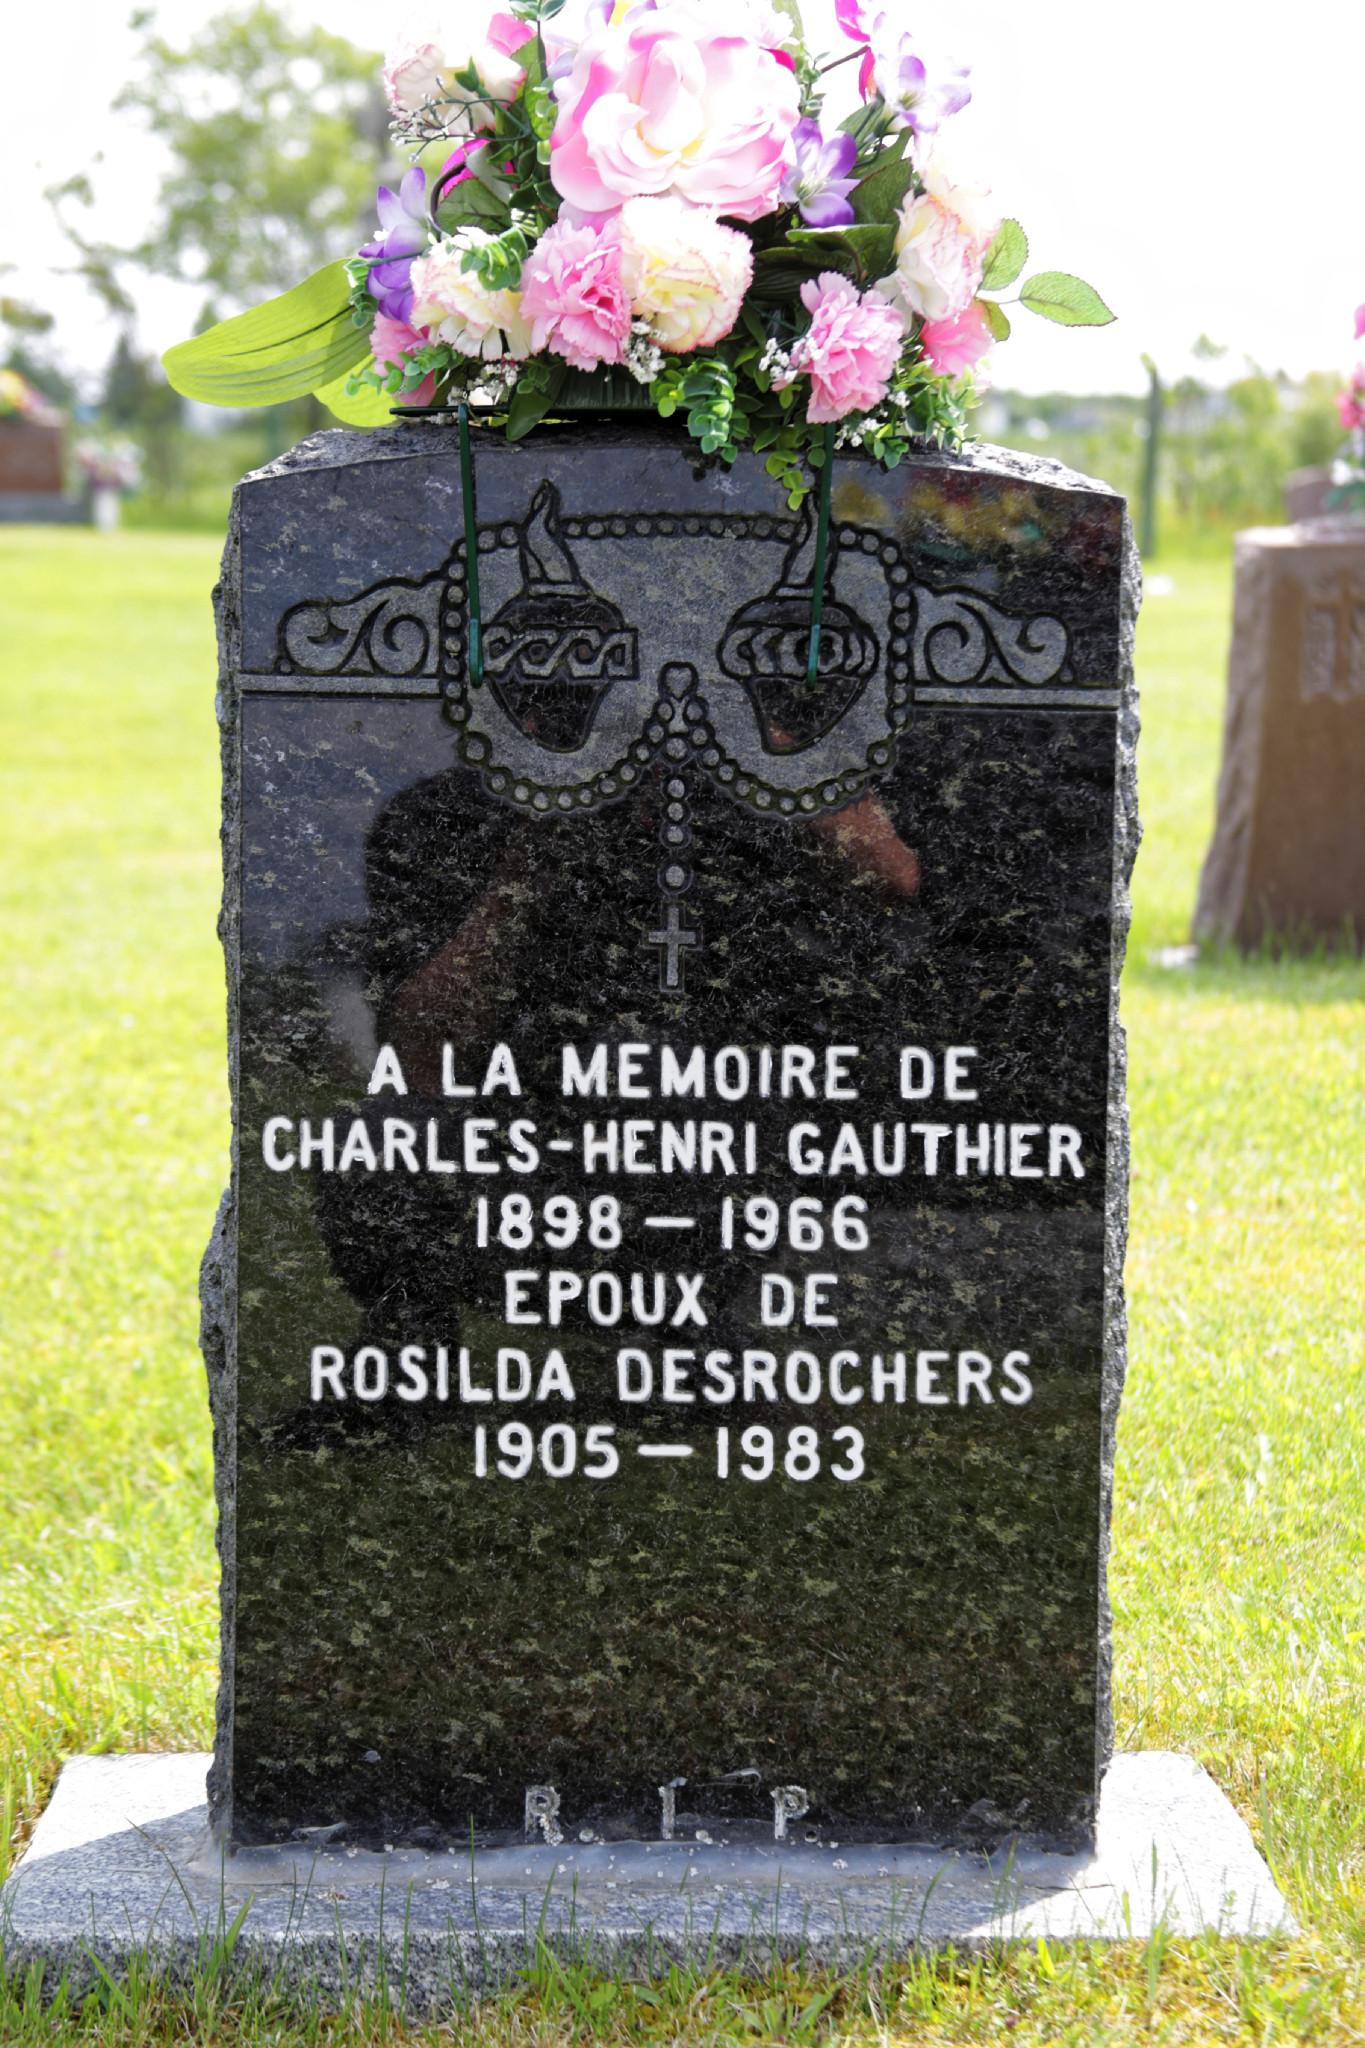 Charles-Henri Gauthier